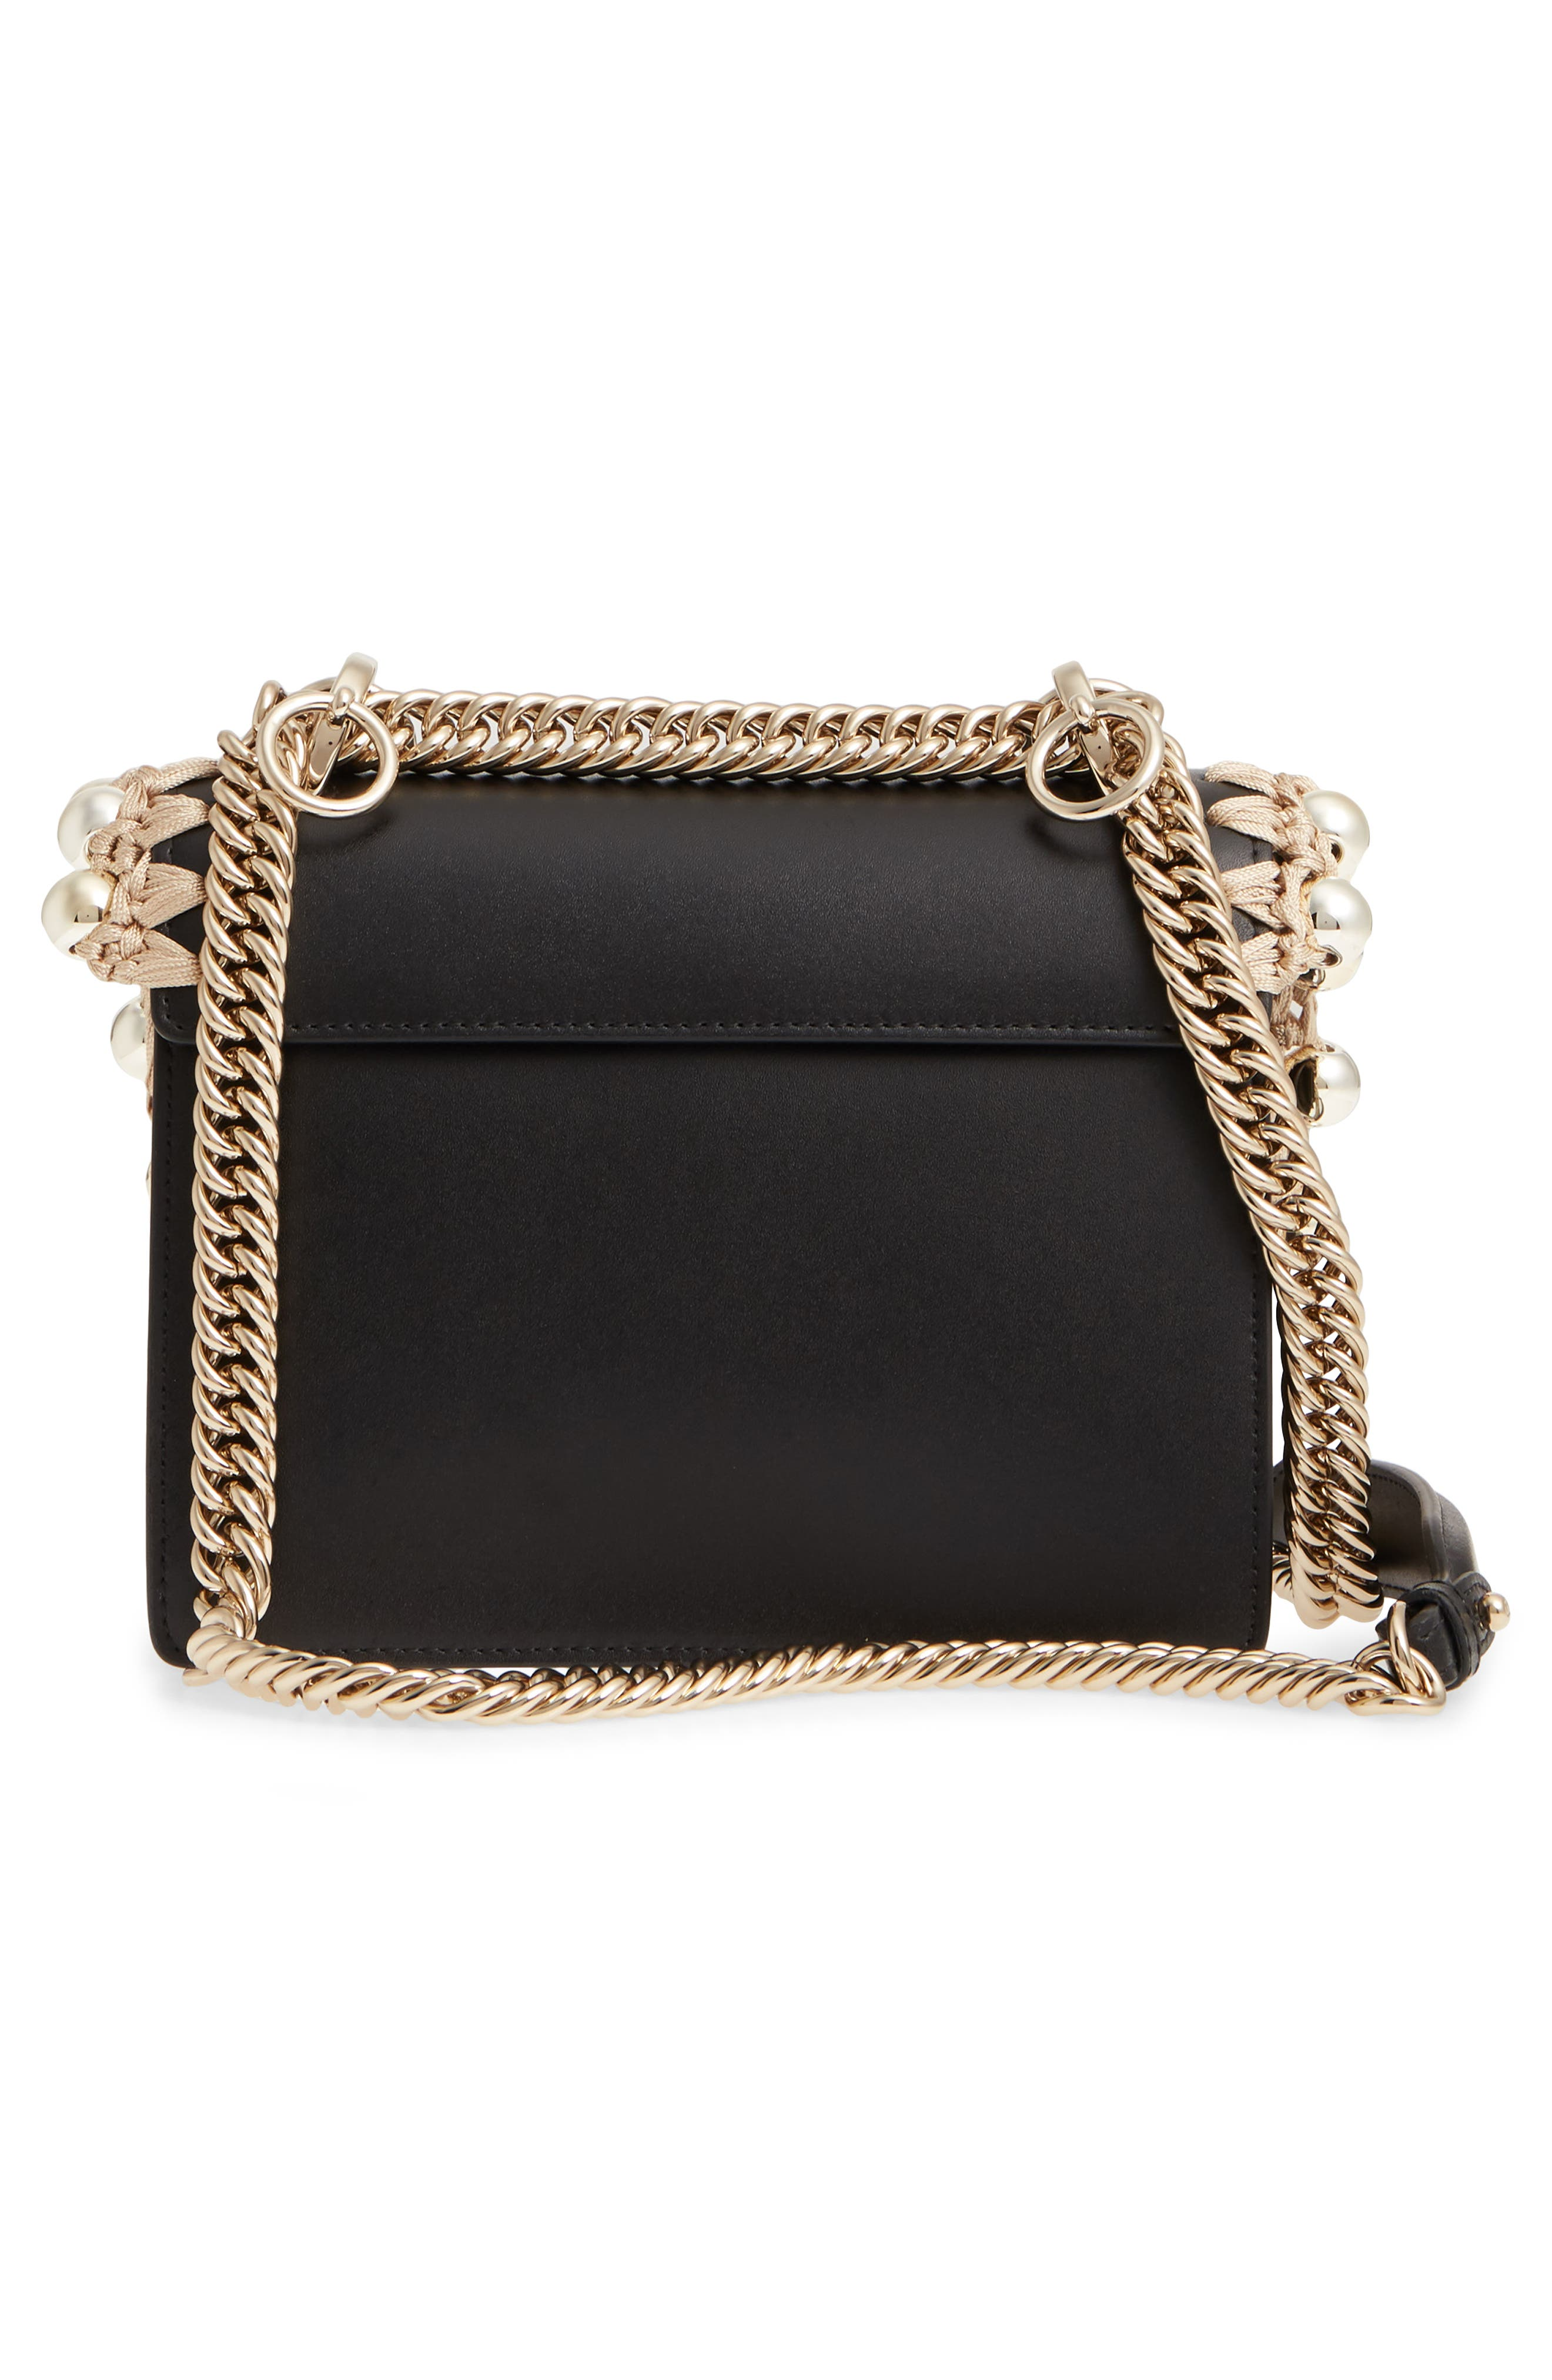 Small Kan I Leather Shoulder Bag,                             Alternate thumbnail 6, color,                             Nero/ Oro/ Chiaro